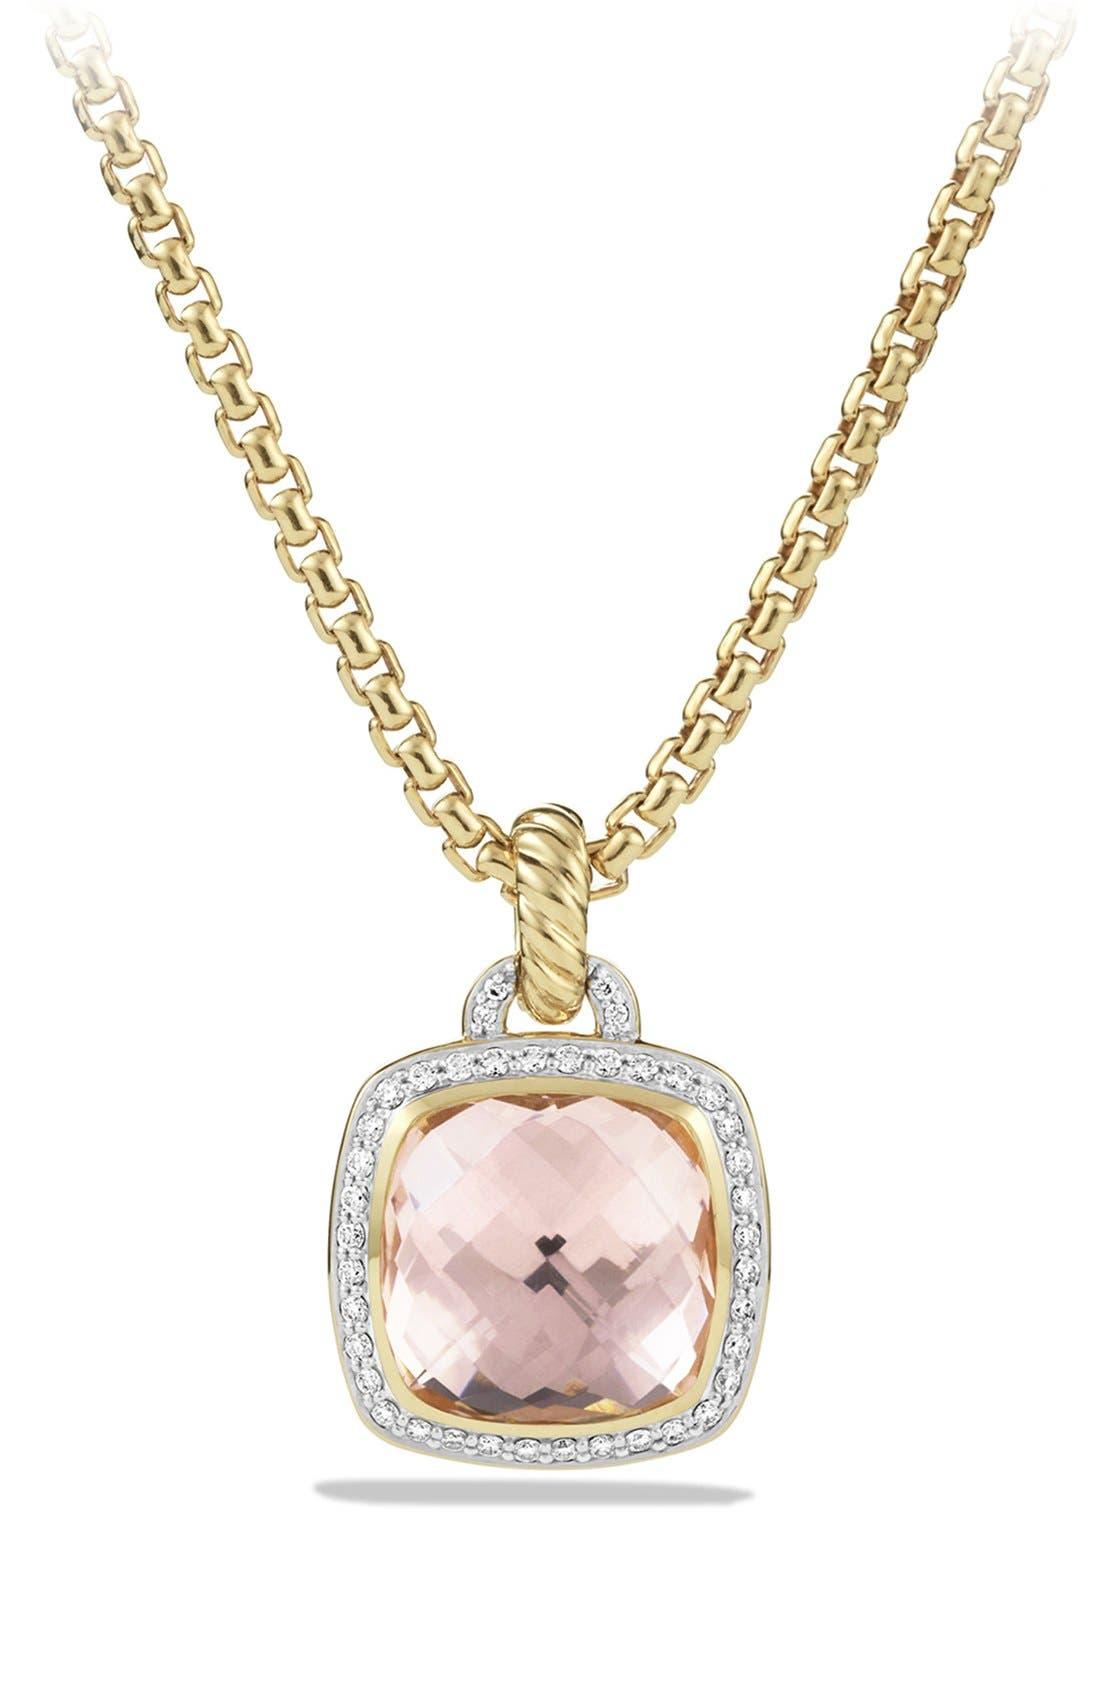 'Albion' Pendant with Lemon Citrine and Diamonds in 18k Gold,                         Main,                         color, Morganite